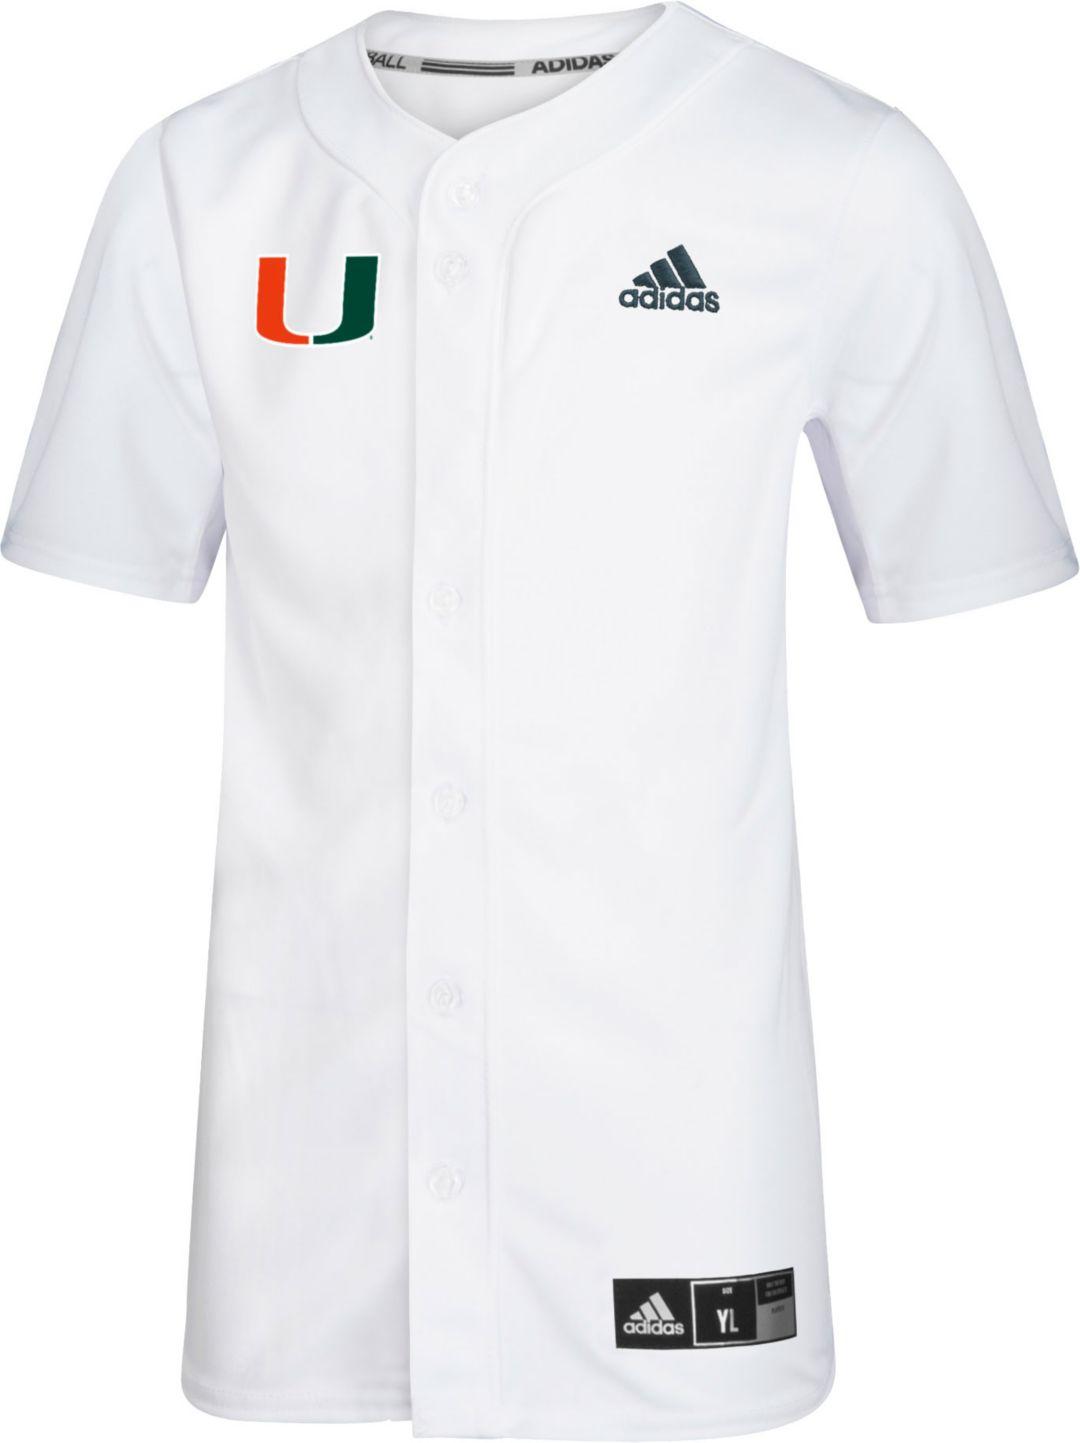 best service 37c96 94509 adidas Youth Miami Hurricanes #19 Full-Button Replica Baseball White Jersey